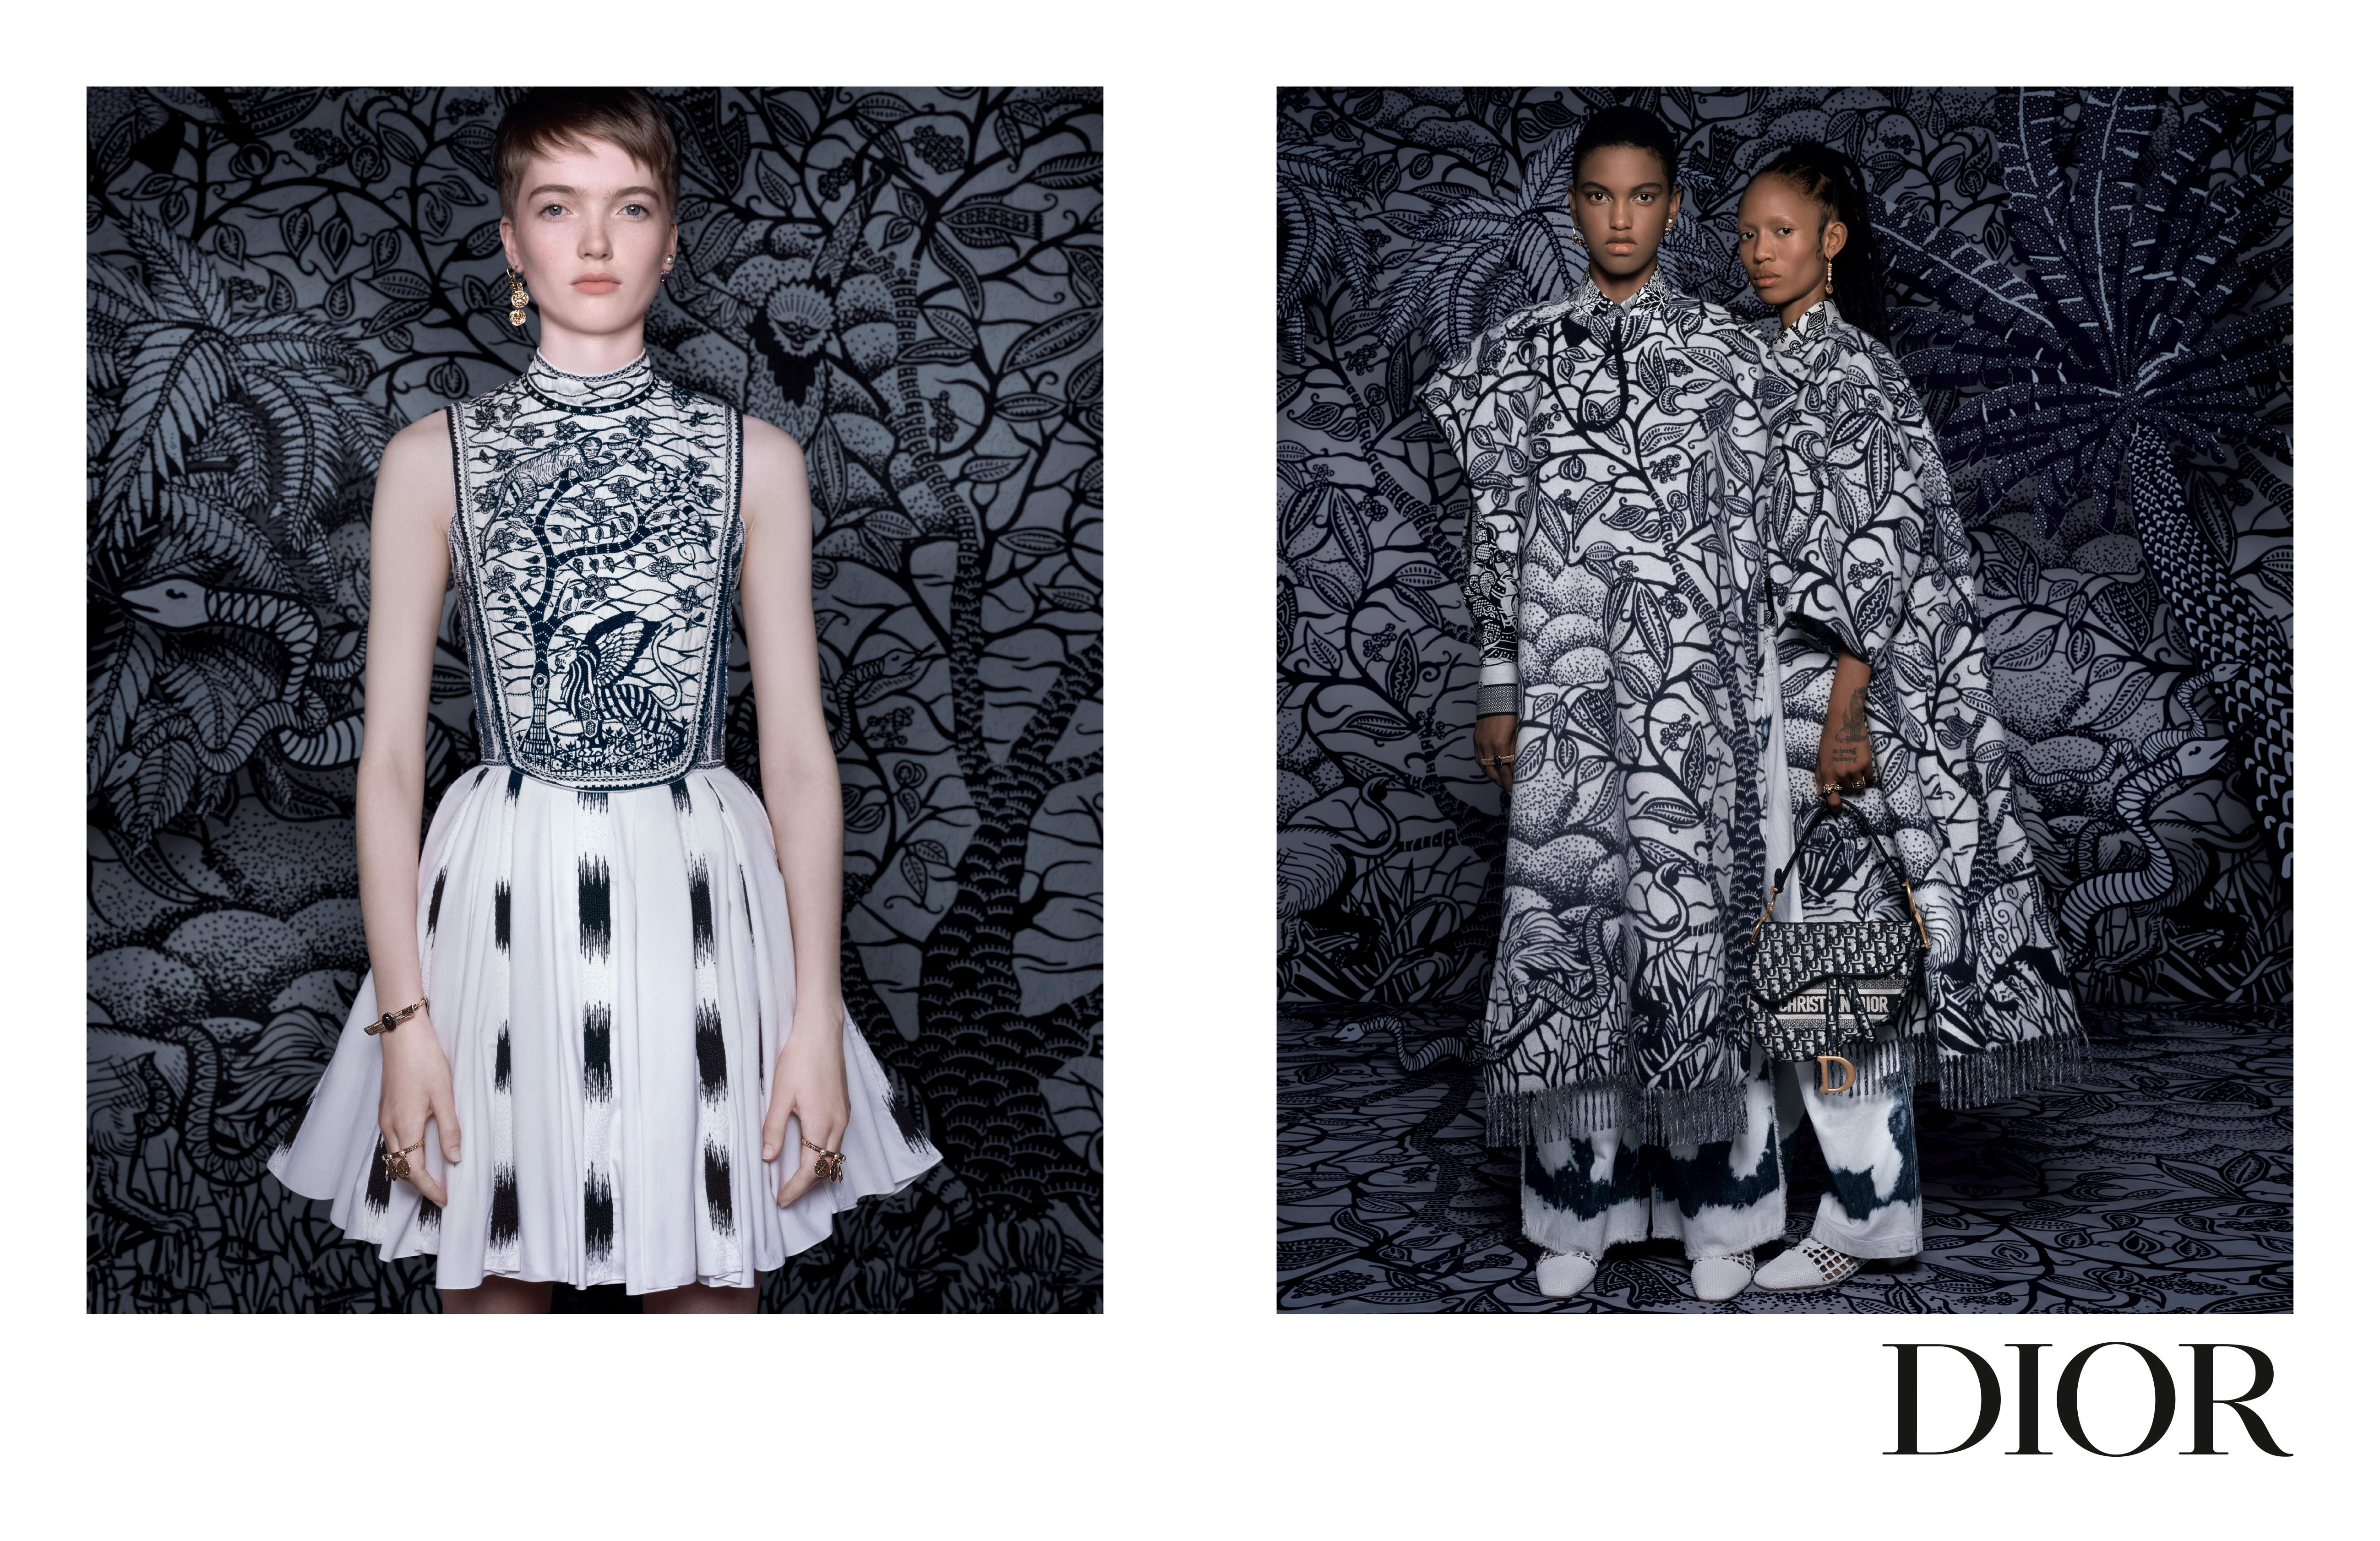 Dior早春系列廣告由攝影師 Brigitte Niedermair操刀,表現出品牌的迷人神韻。